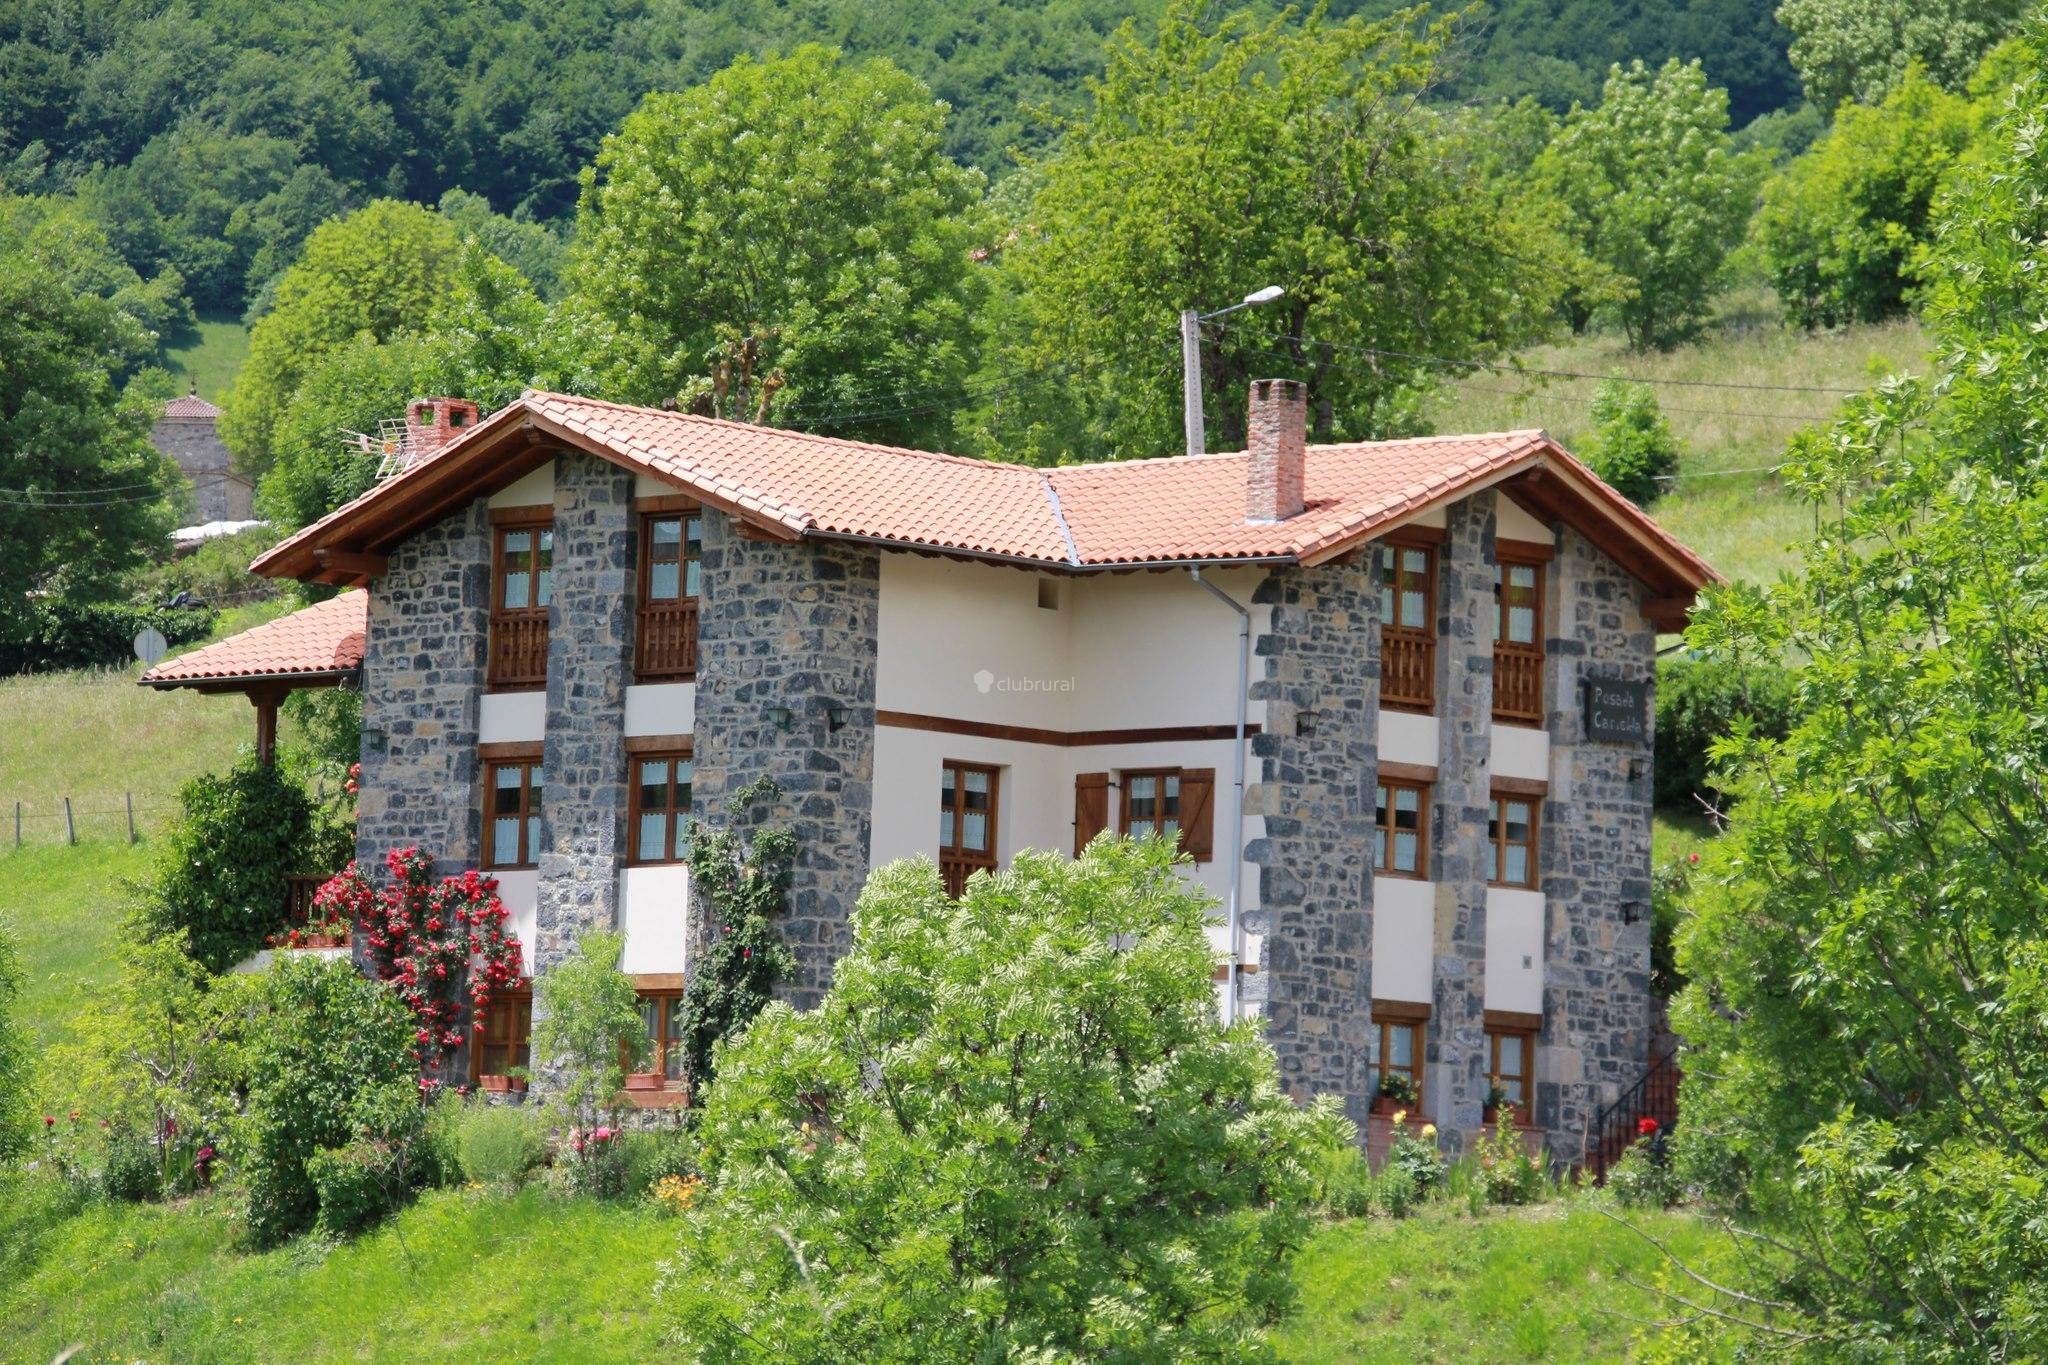 Fotos de casa de labranza carielda cantabria camale o - Casas rurales cantabria baratas alquiler integro ...